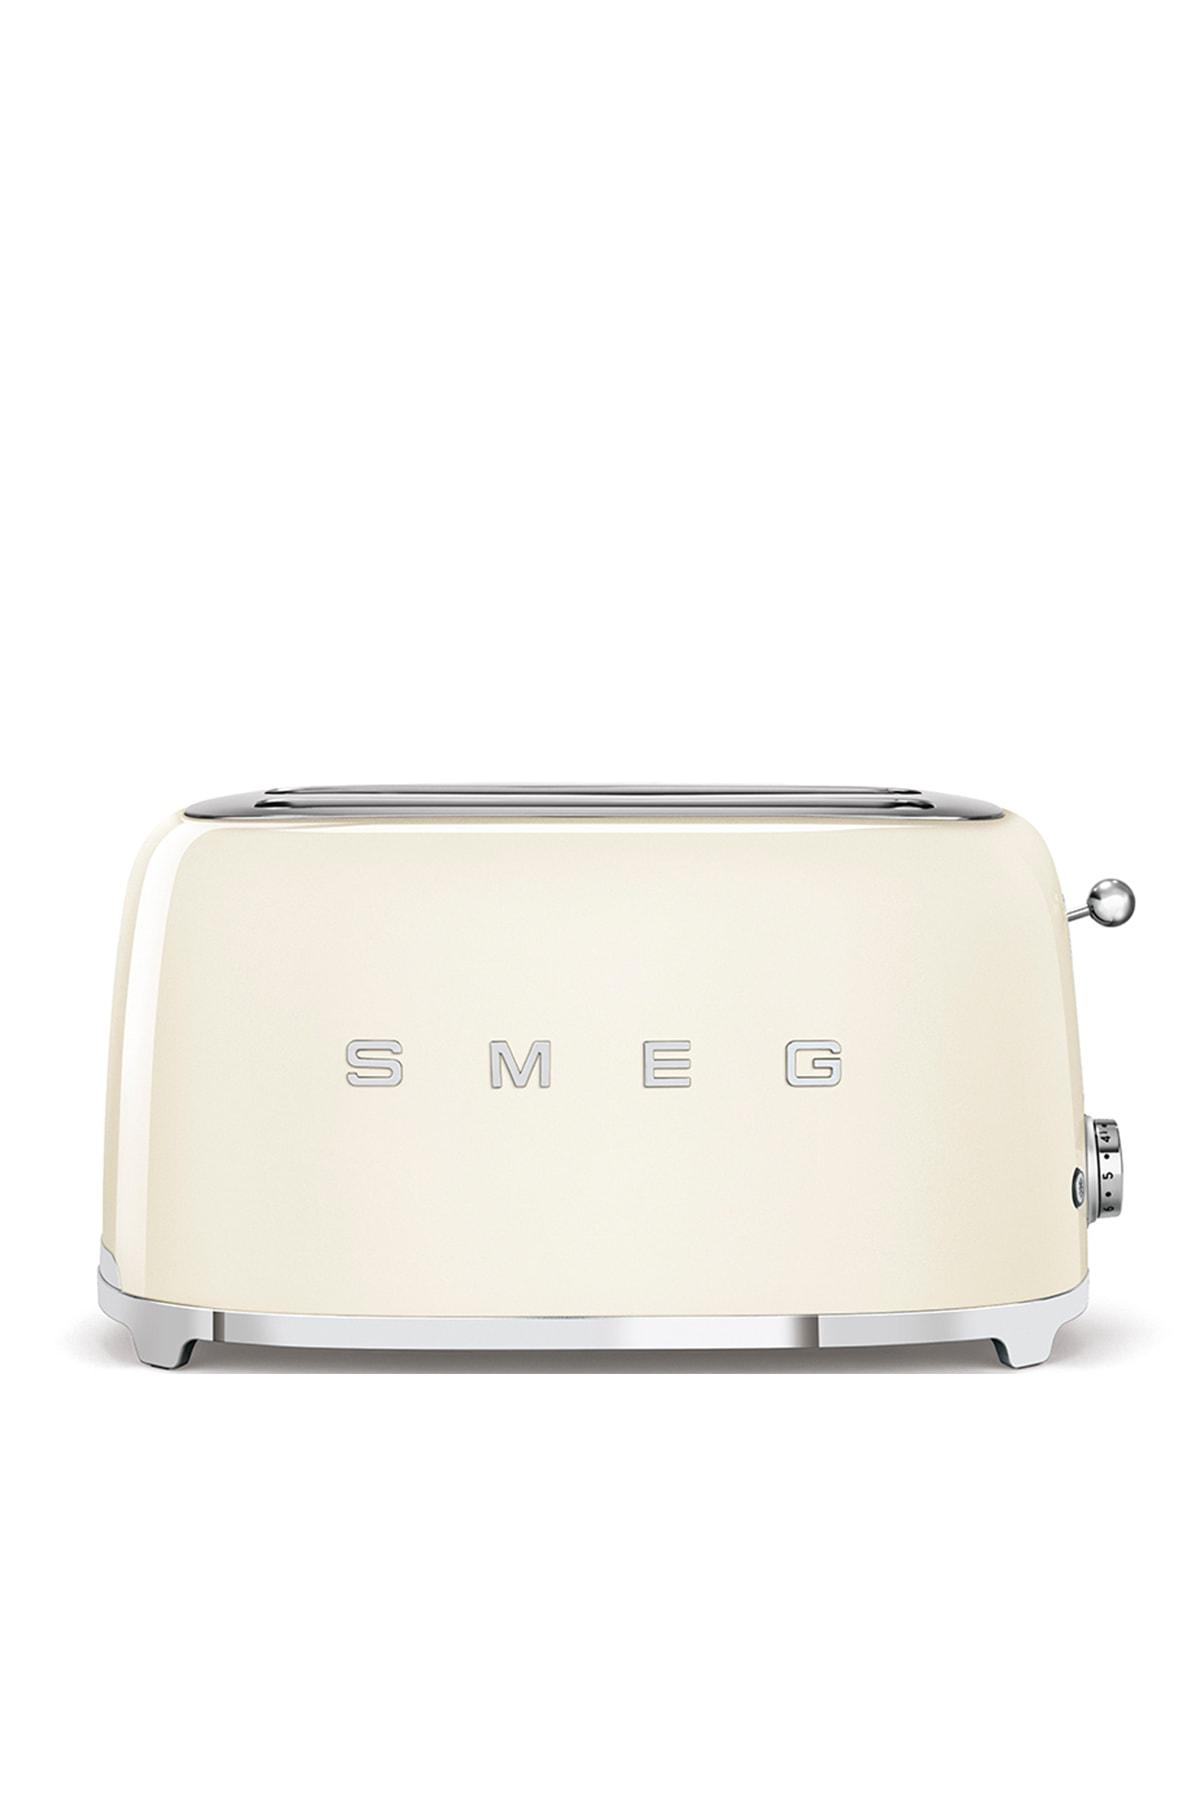 SMEG Krem 4 Dilimli Ekmek Kızartma Makinesi Tsf02creu 1